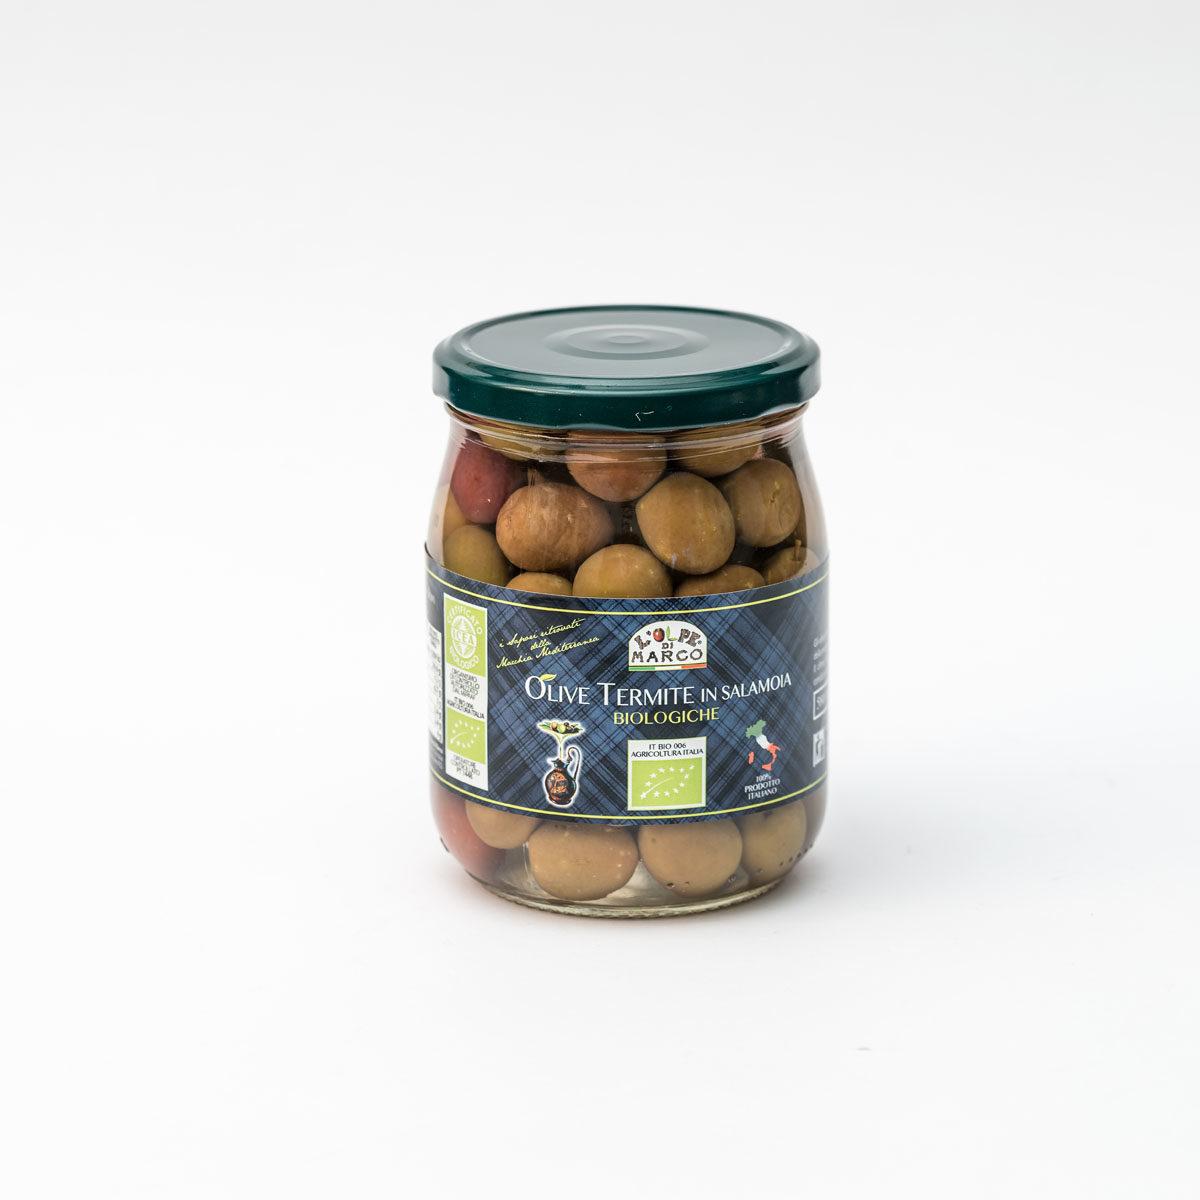 Olive-termite-in-salamoia